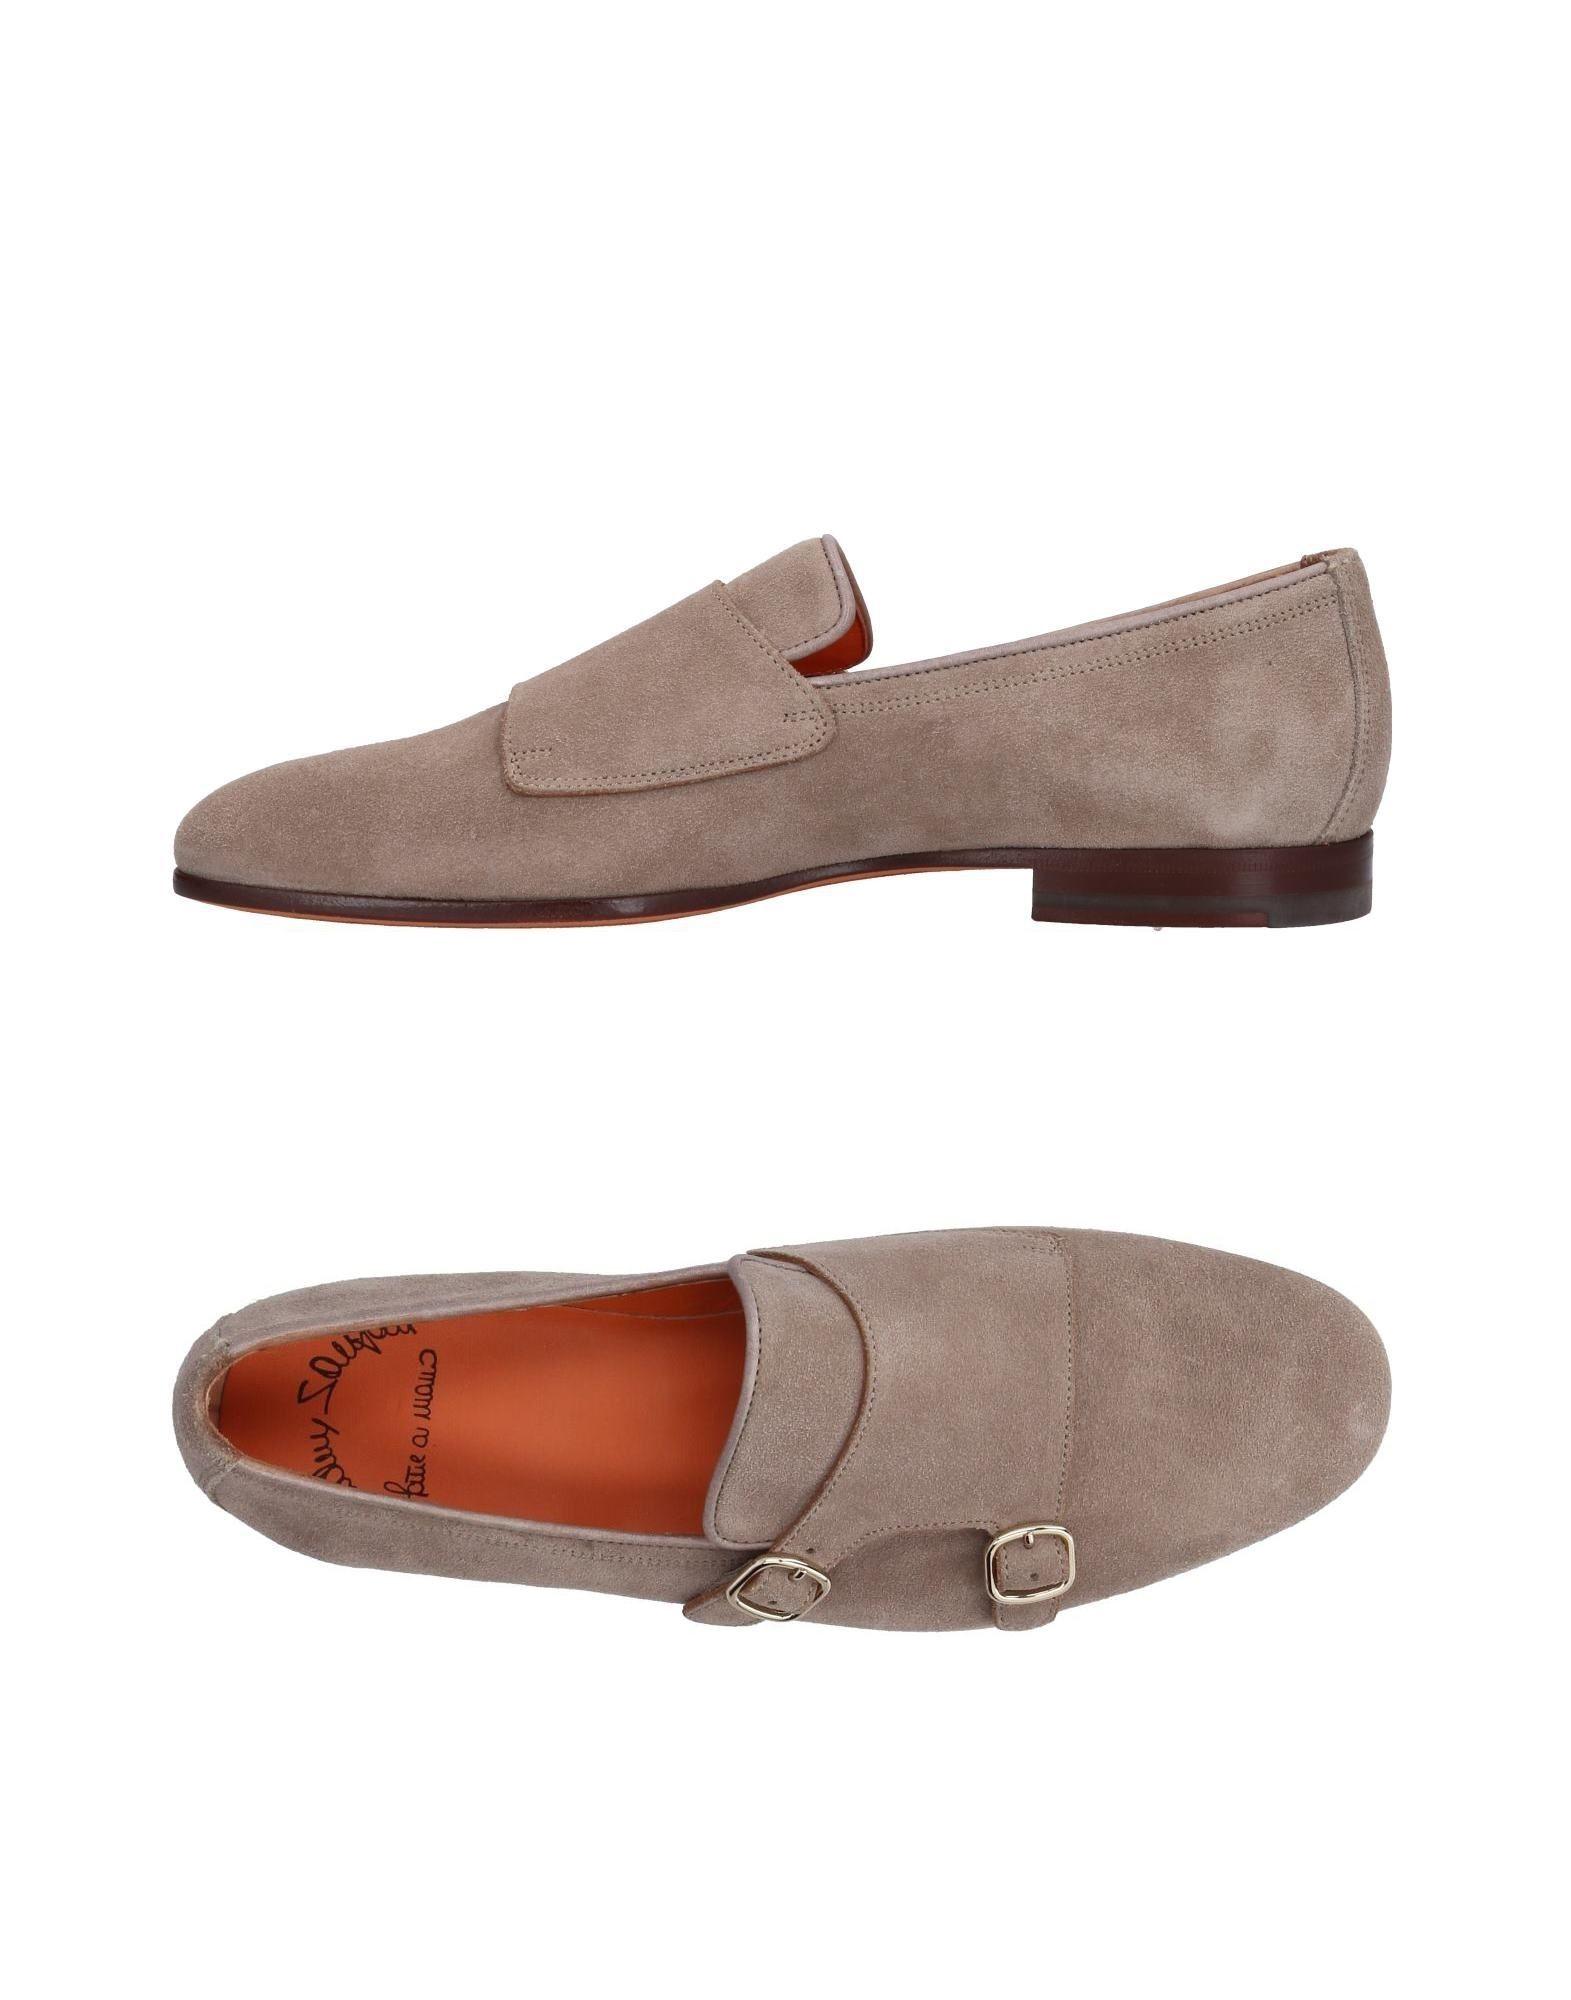 Santoni Mokassins Herren  11183890MN Gute Qualität beliebte Schuhe